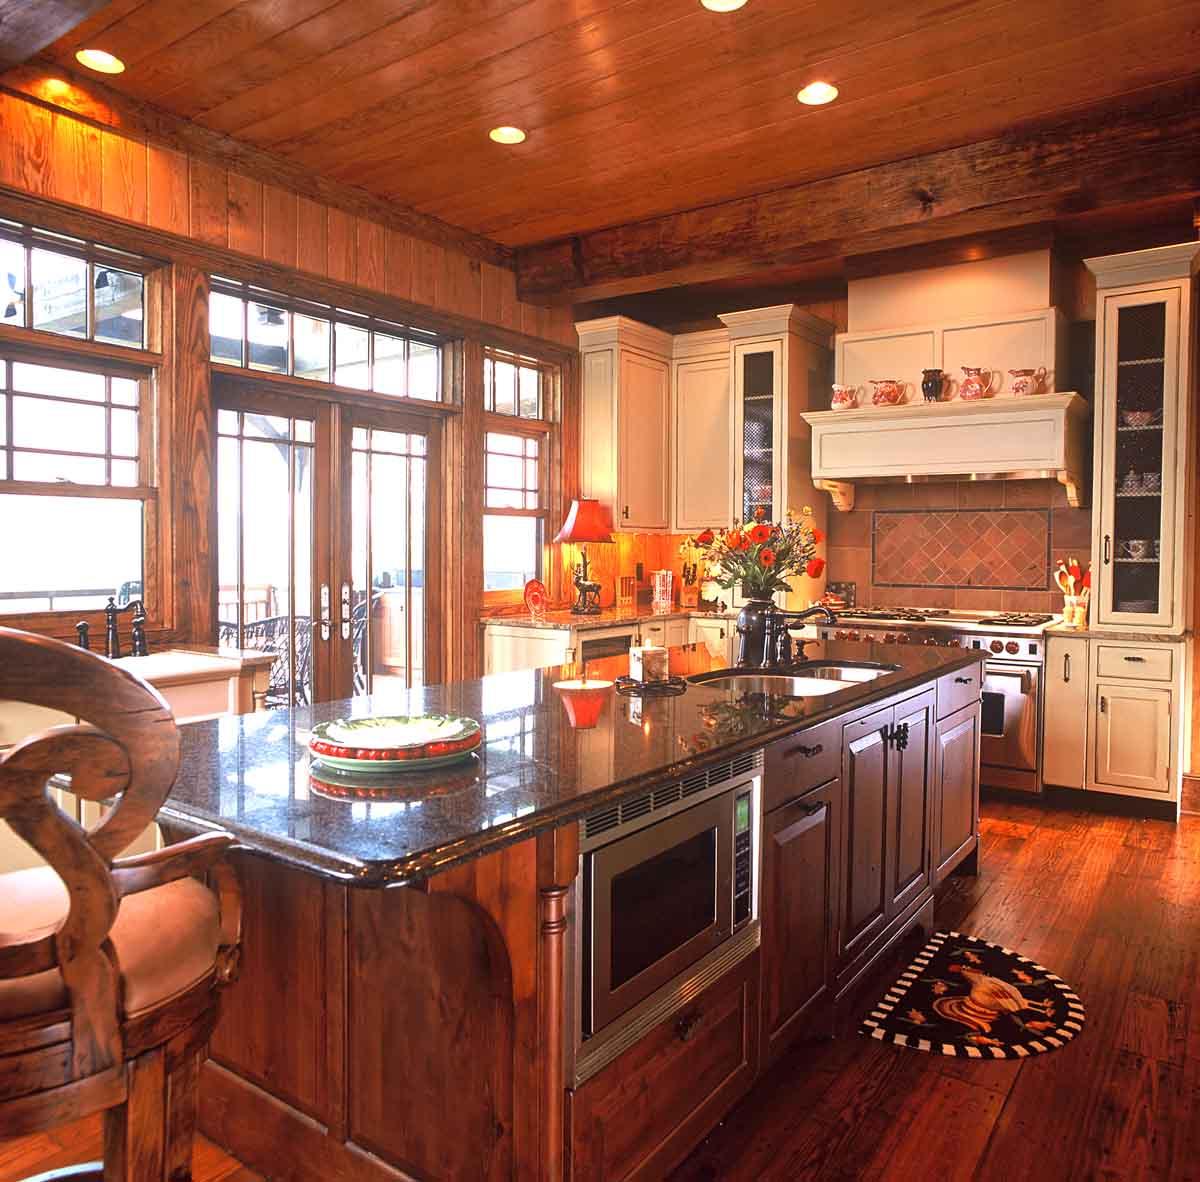 rand soellner architect kitchen design (C)Copyright 2005-2011 Rand Soellner